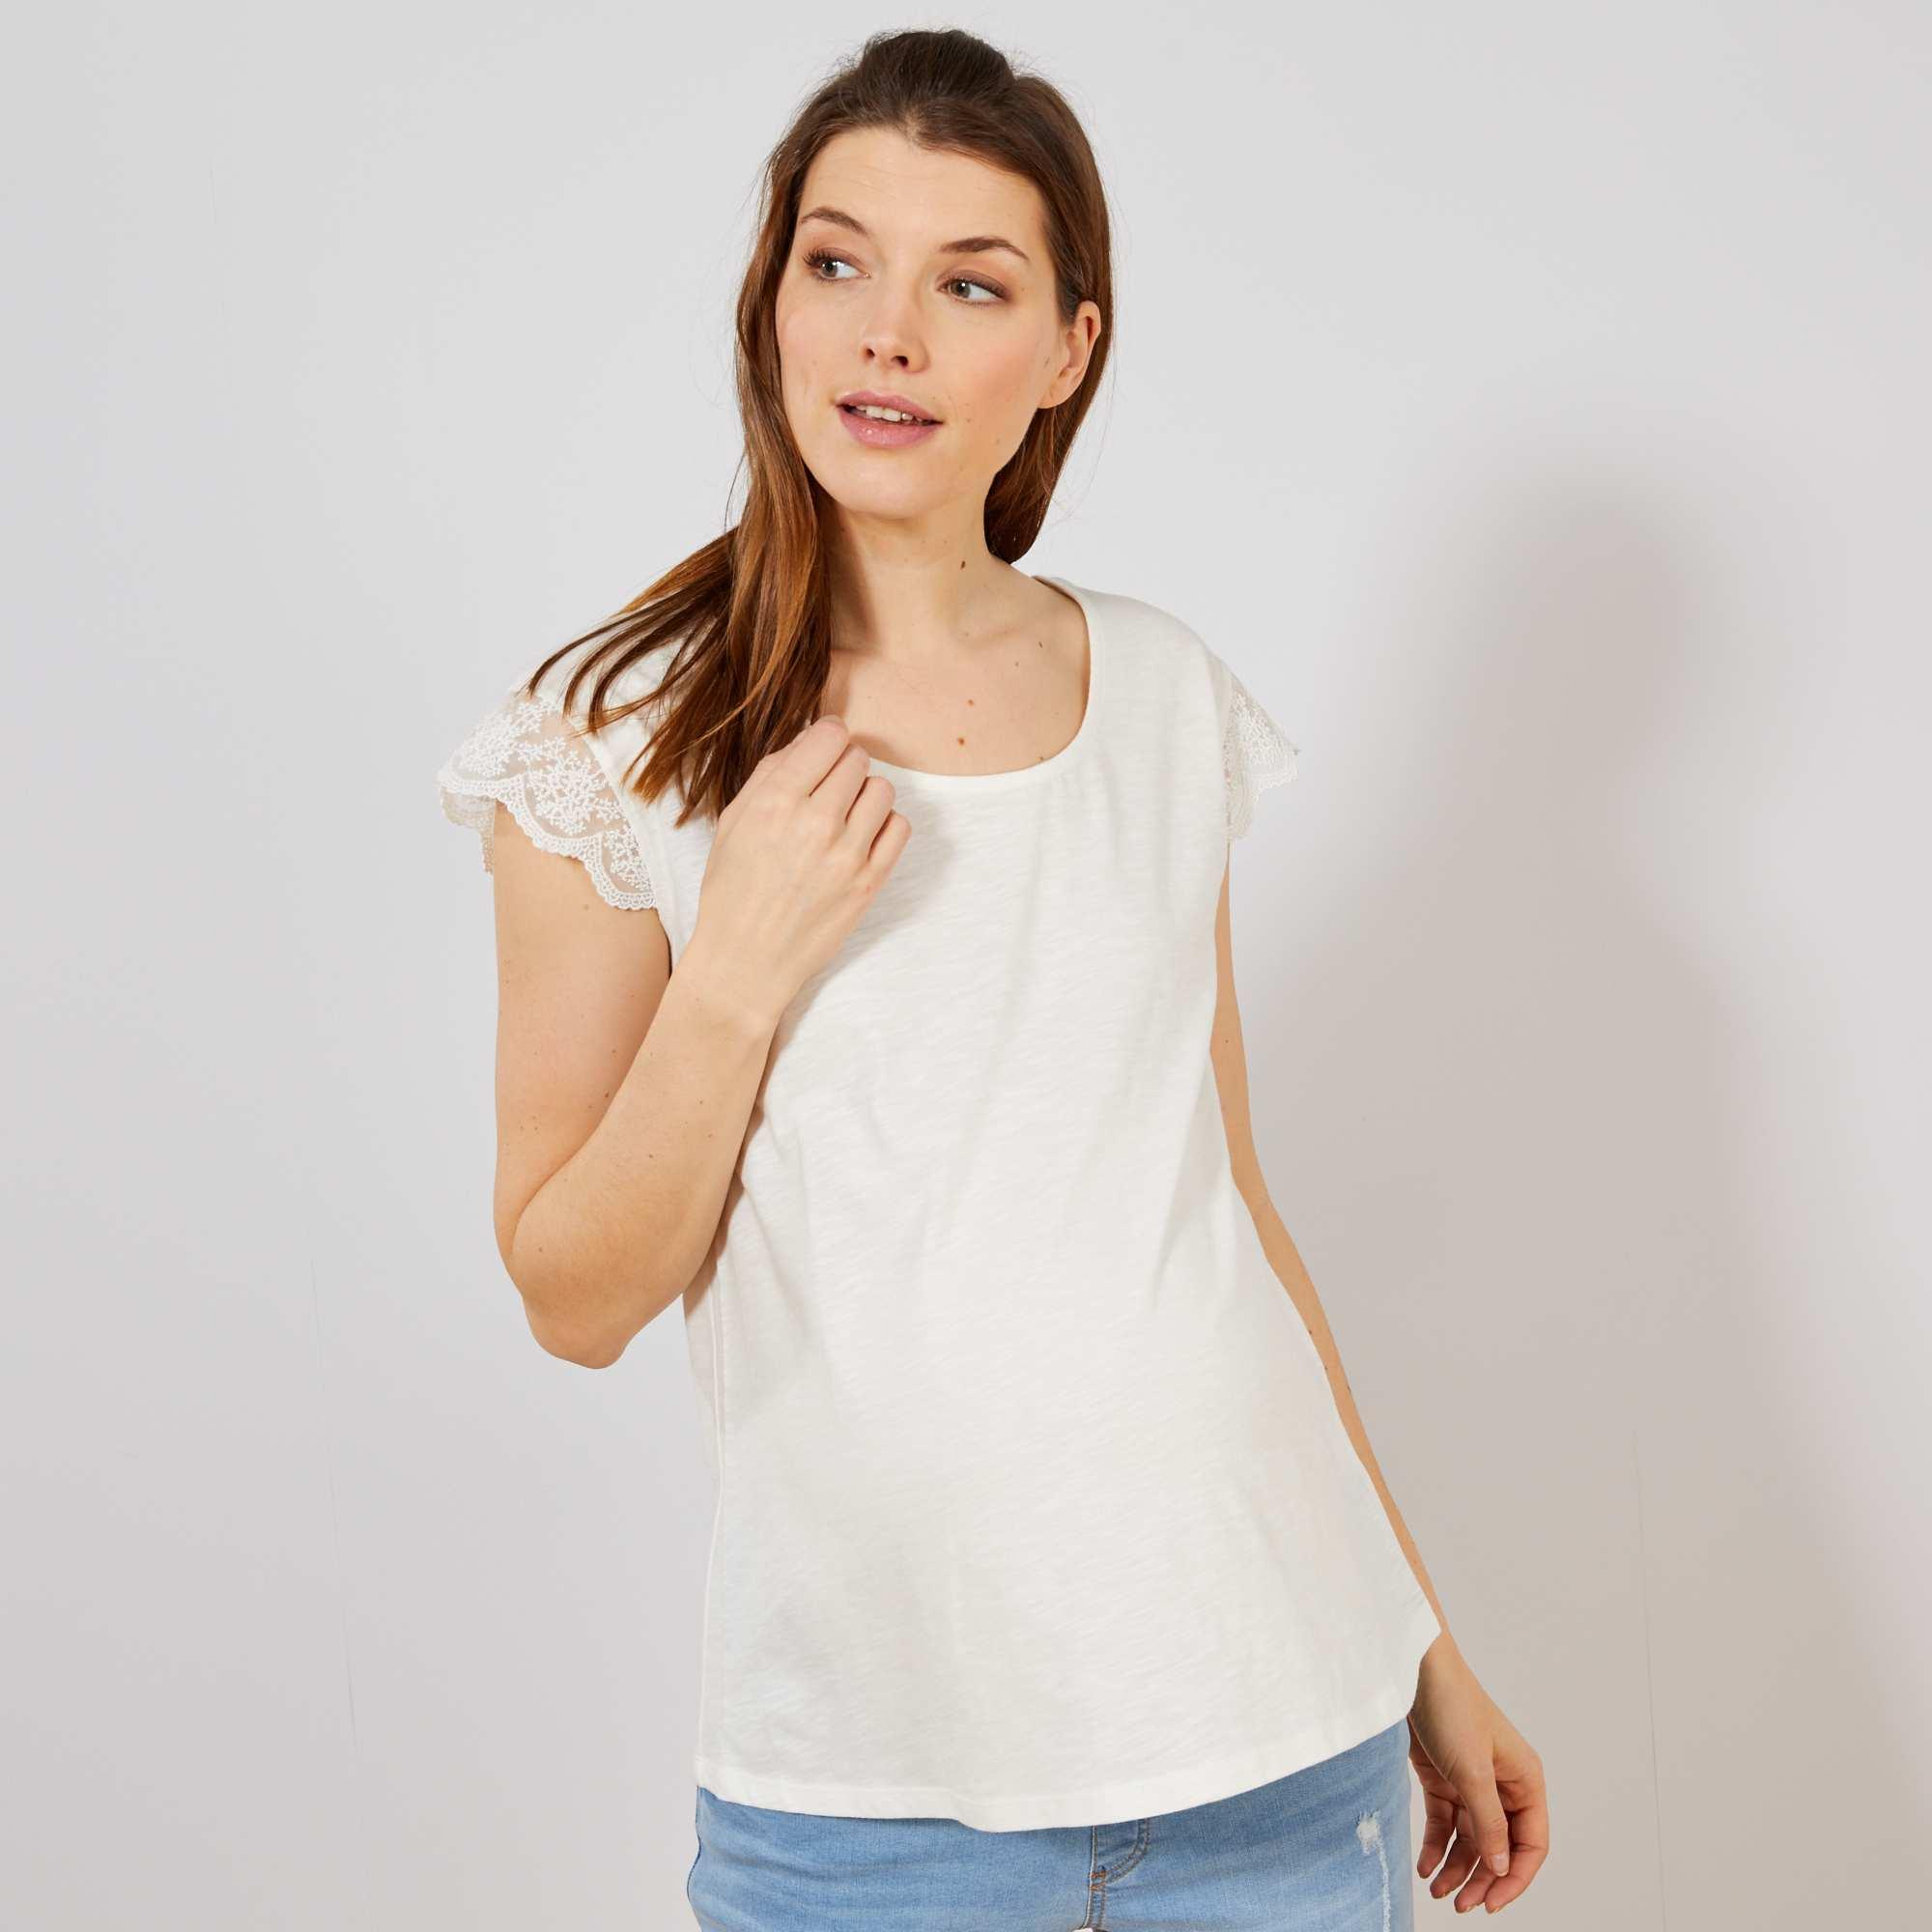 Manches Shirt T Blanc De Kiabi Maternité Dentelle 5 Femme Szuqvpm 40€ thrdCsQ